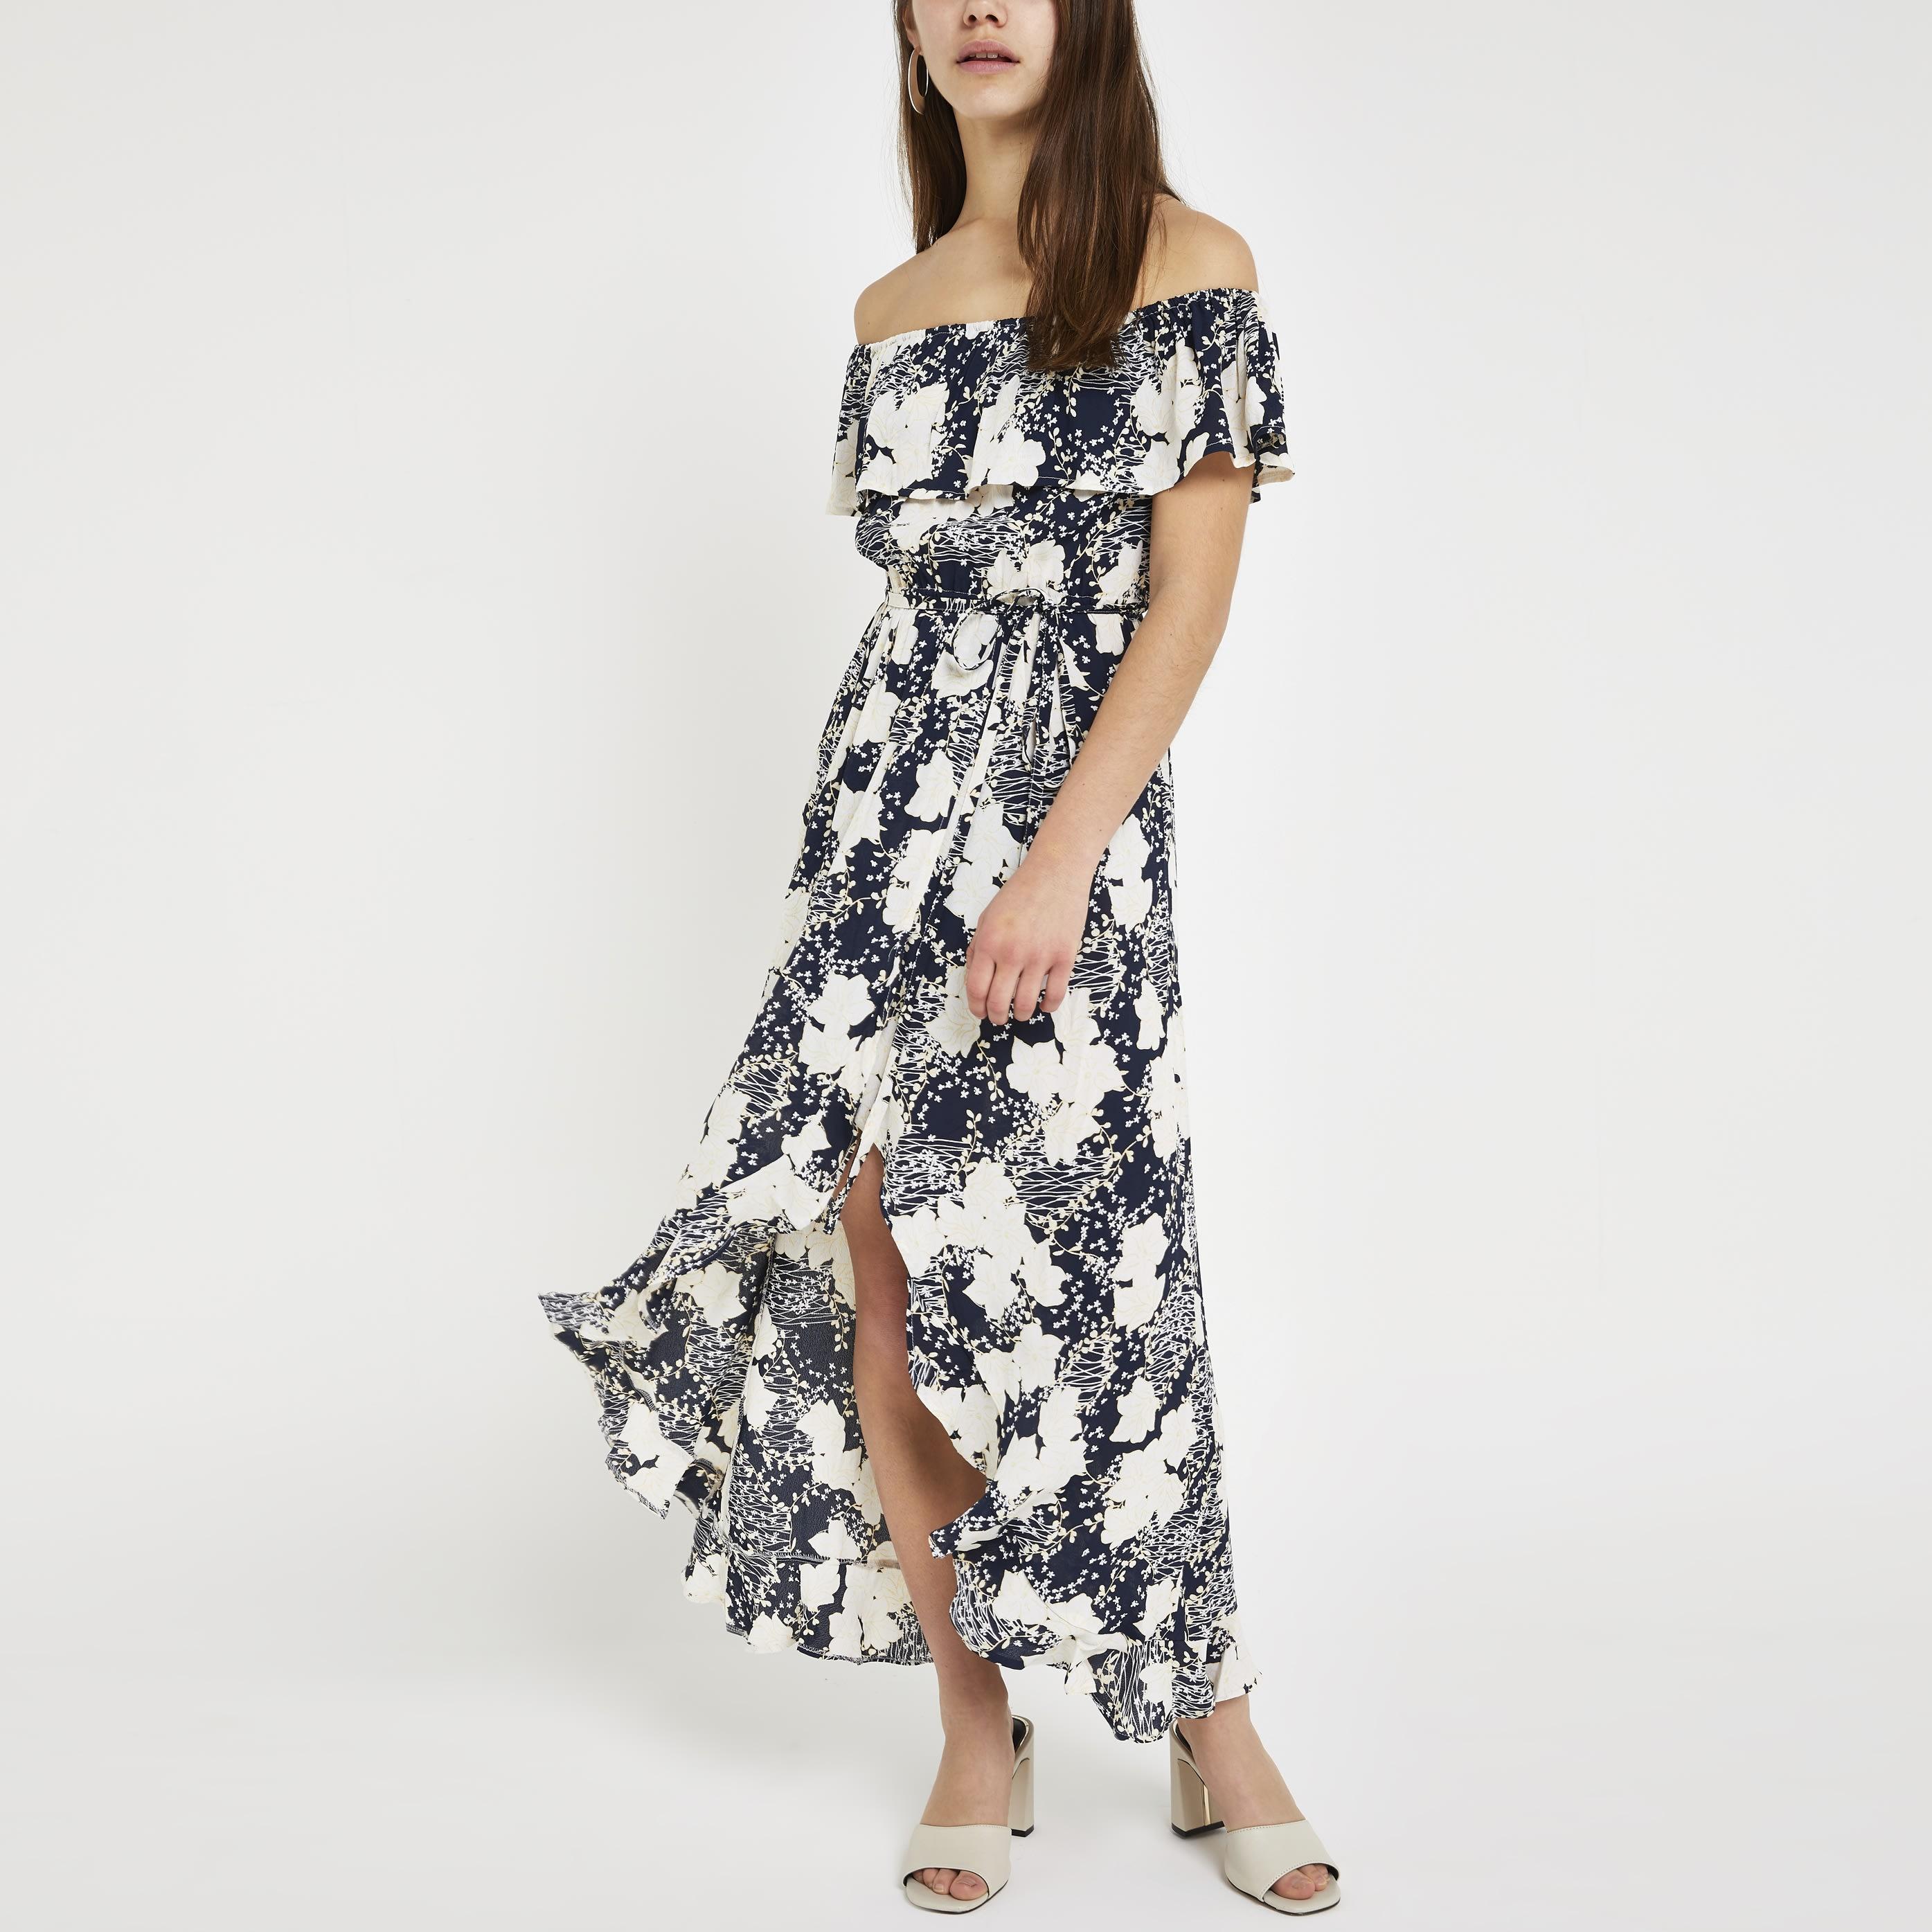 a95baff2d4 Floral Print Petite Maxi Dresses - Gomes Weine AG